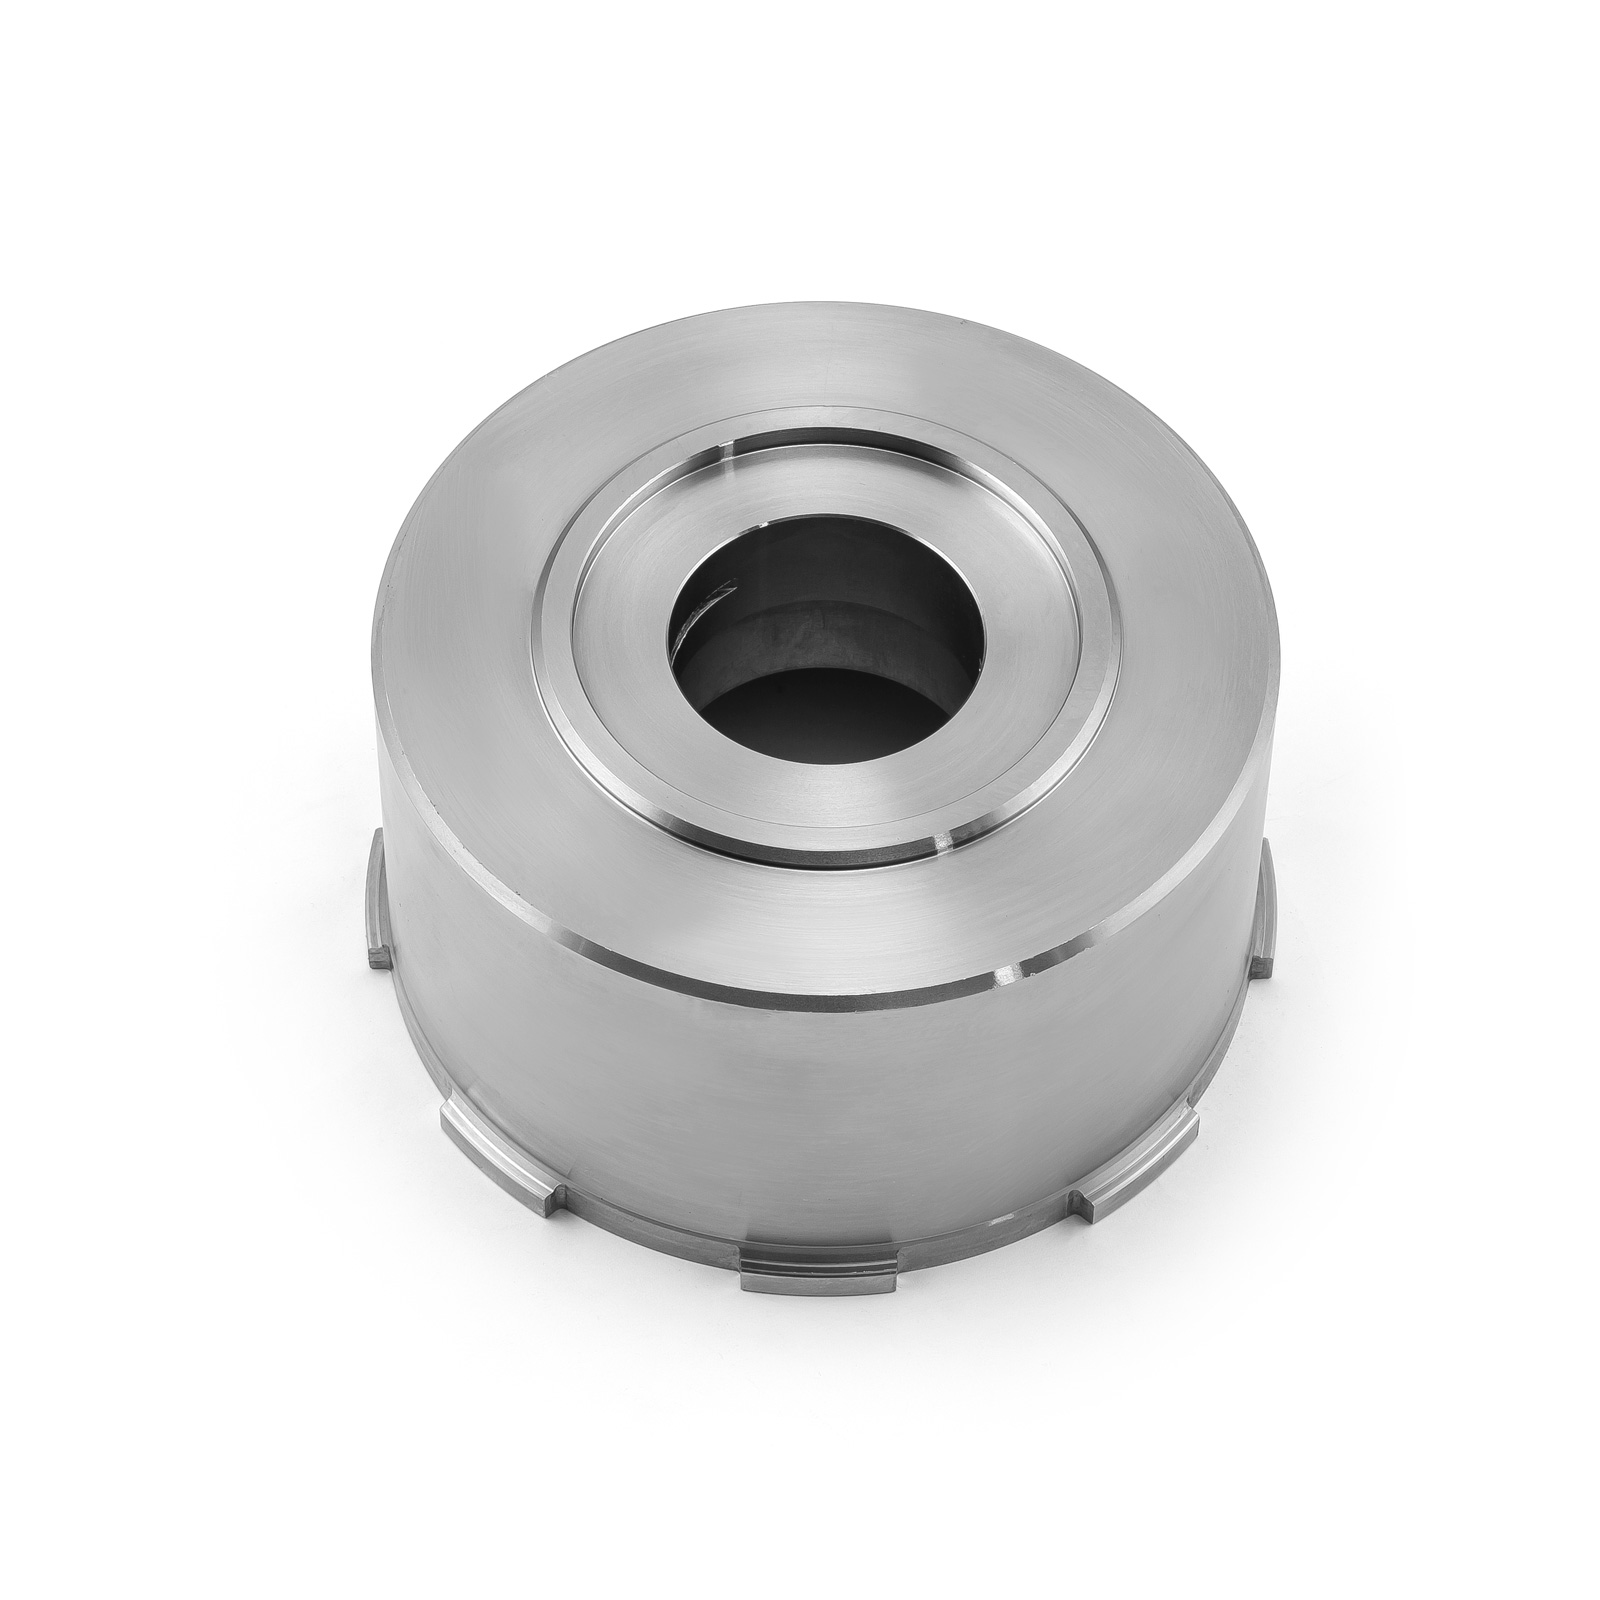 PCE® PCE623.1012 Ford C4 Transmission Billet Steel Direct Clutch Drum